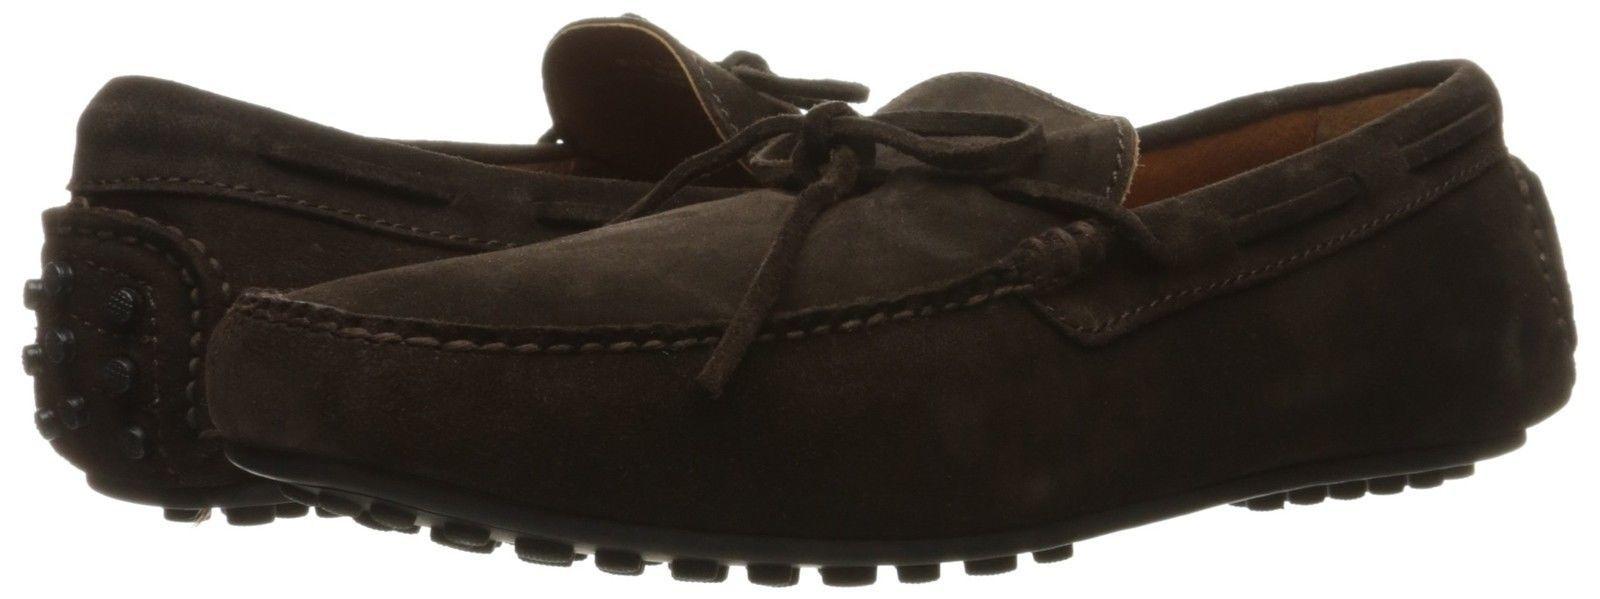 New in Box FRYE Mens Allen Tie Slip-On Loafer Chocolate Brown Suede 11 D(M) US